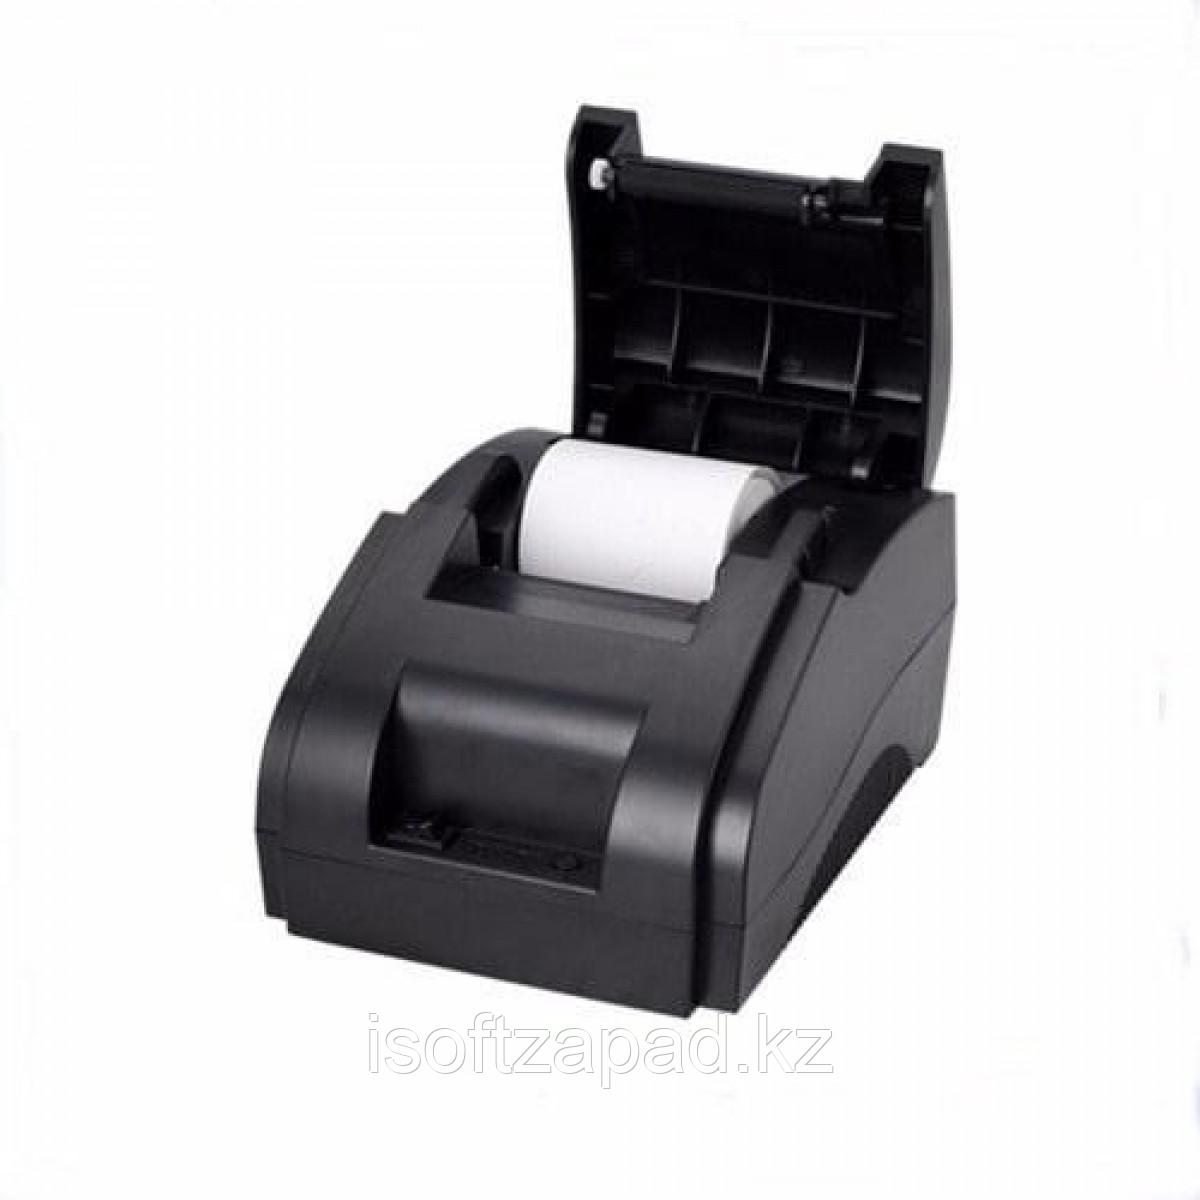 Принтер Пионер RP328USE (USB.SERIAL.LAN.BLACK